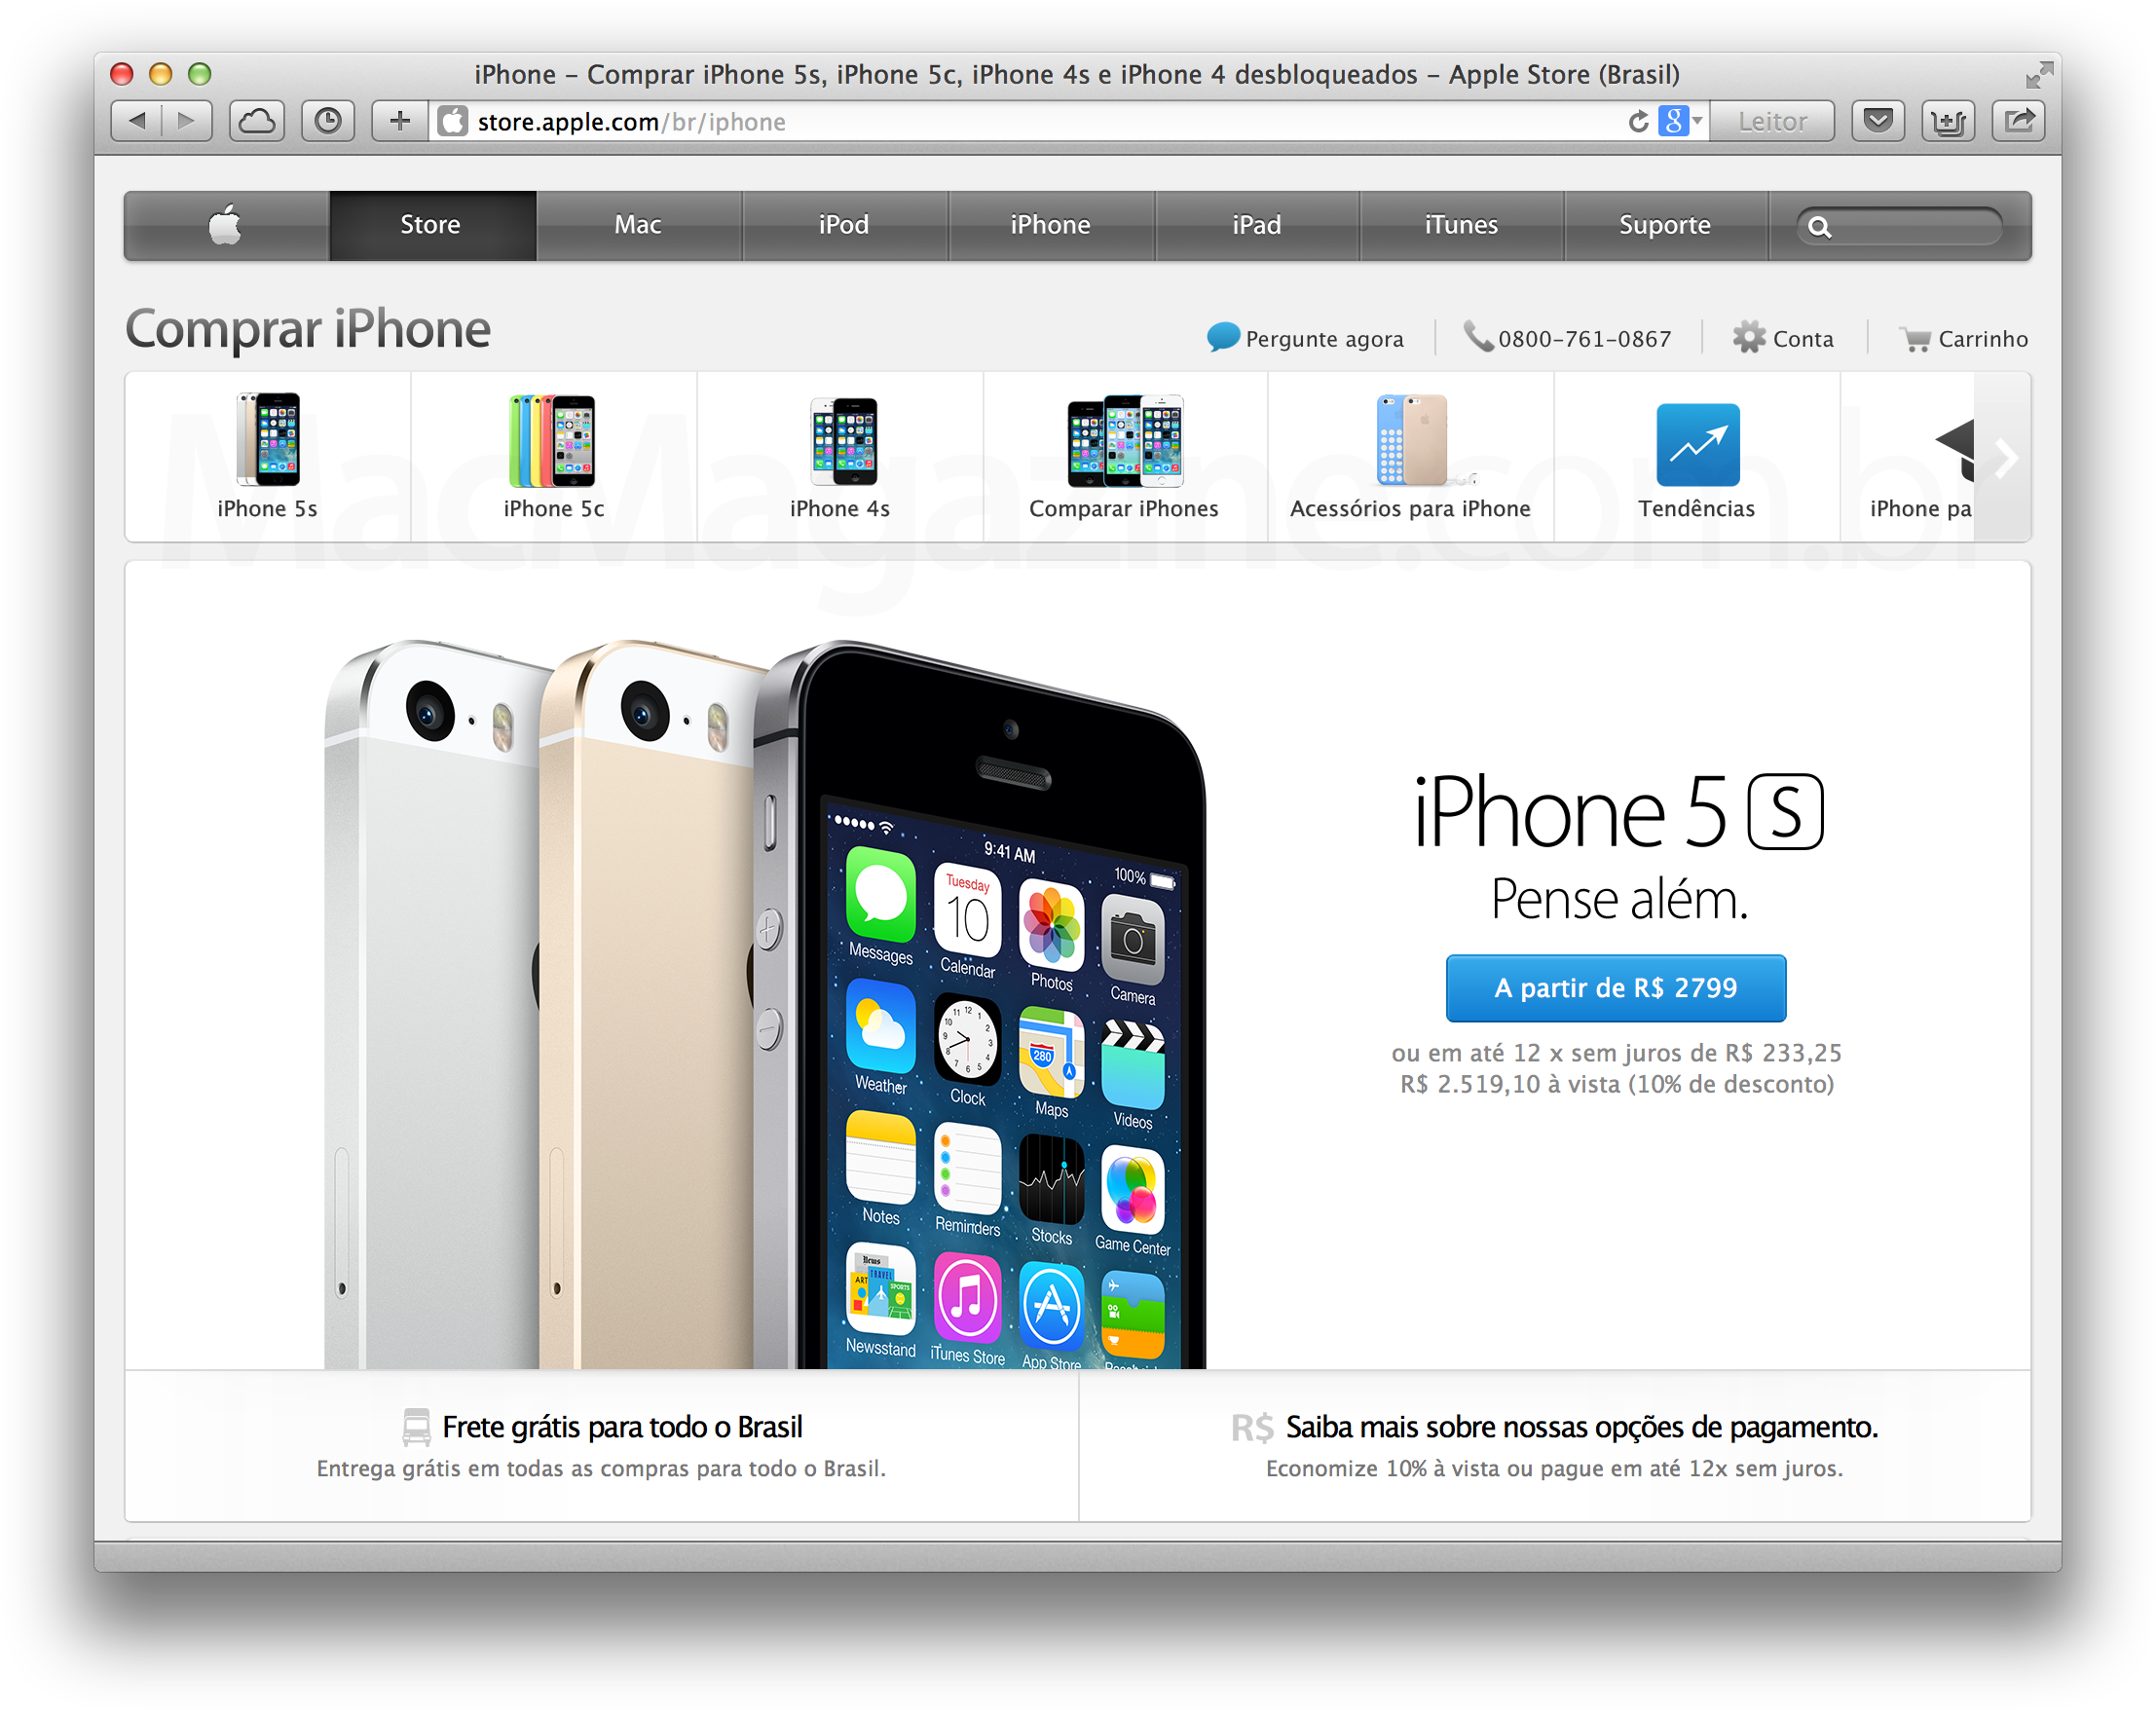 Página de iPhones na Apple Online Store